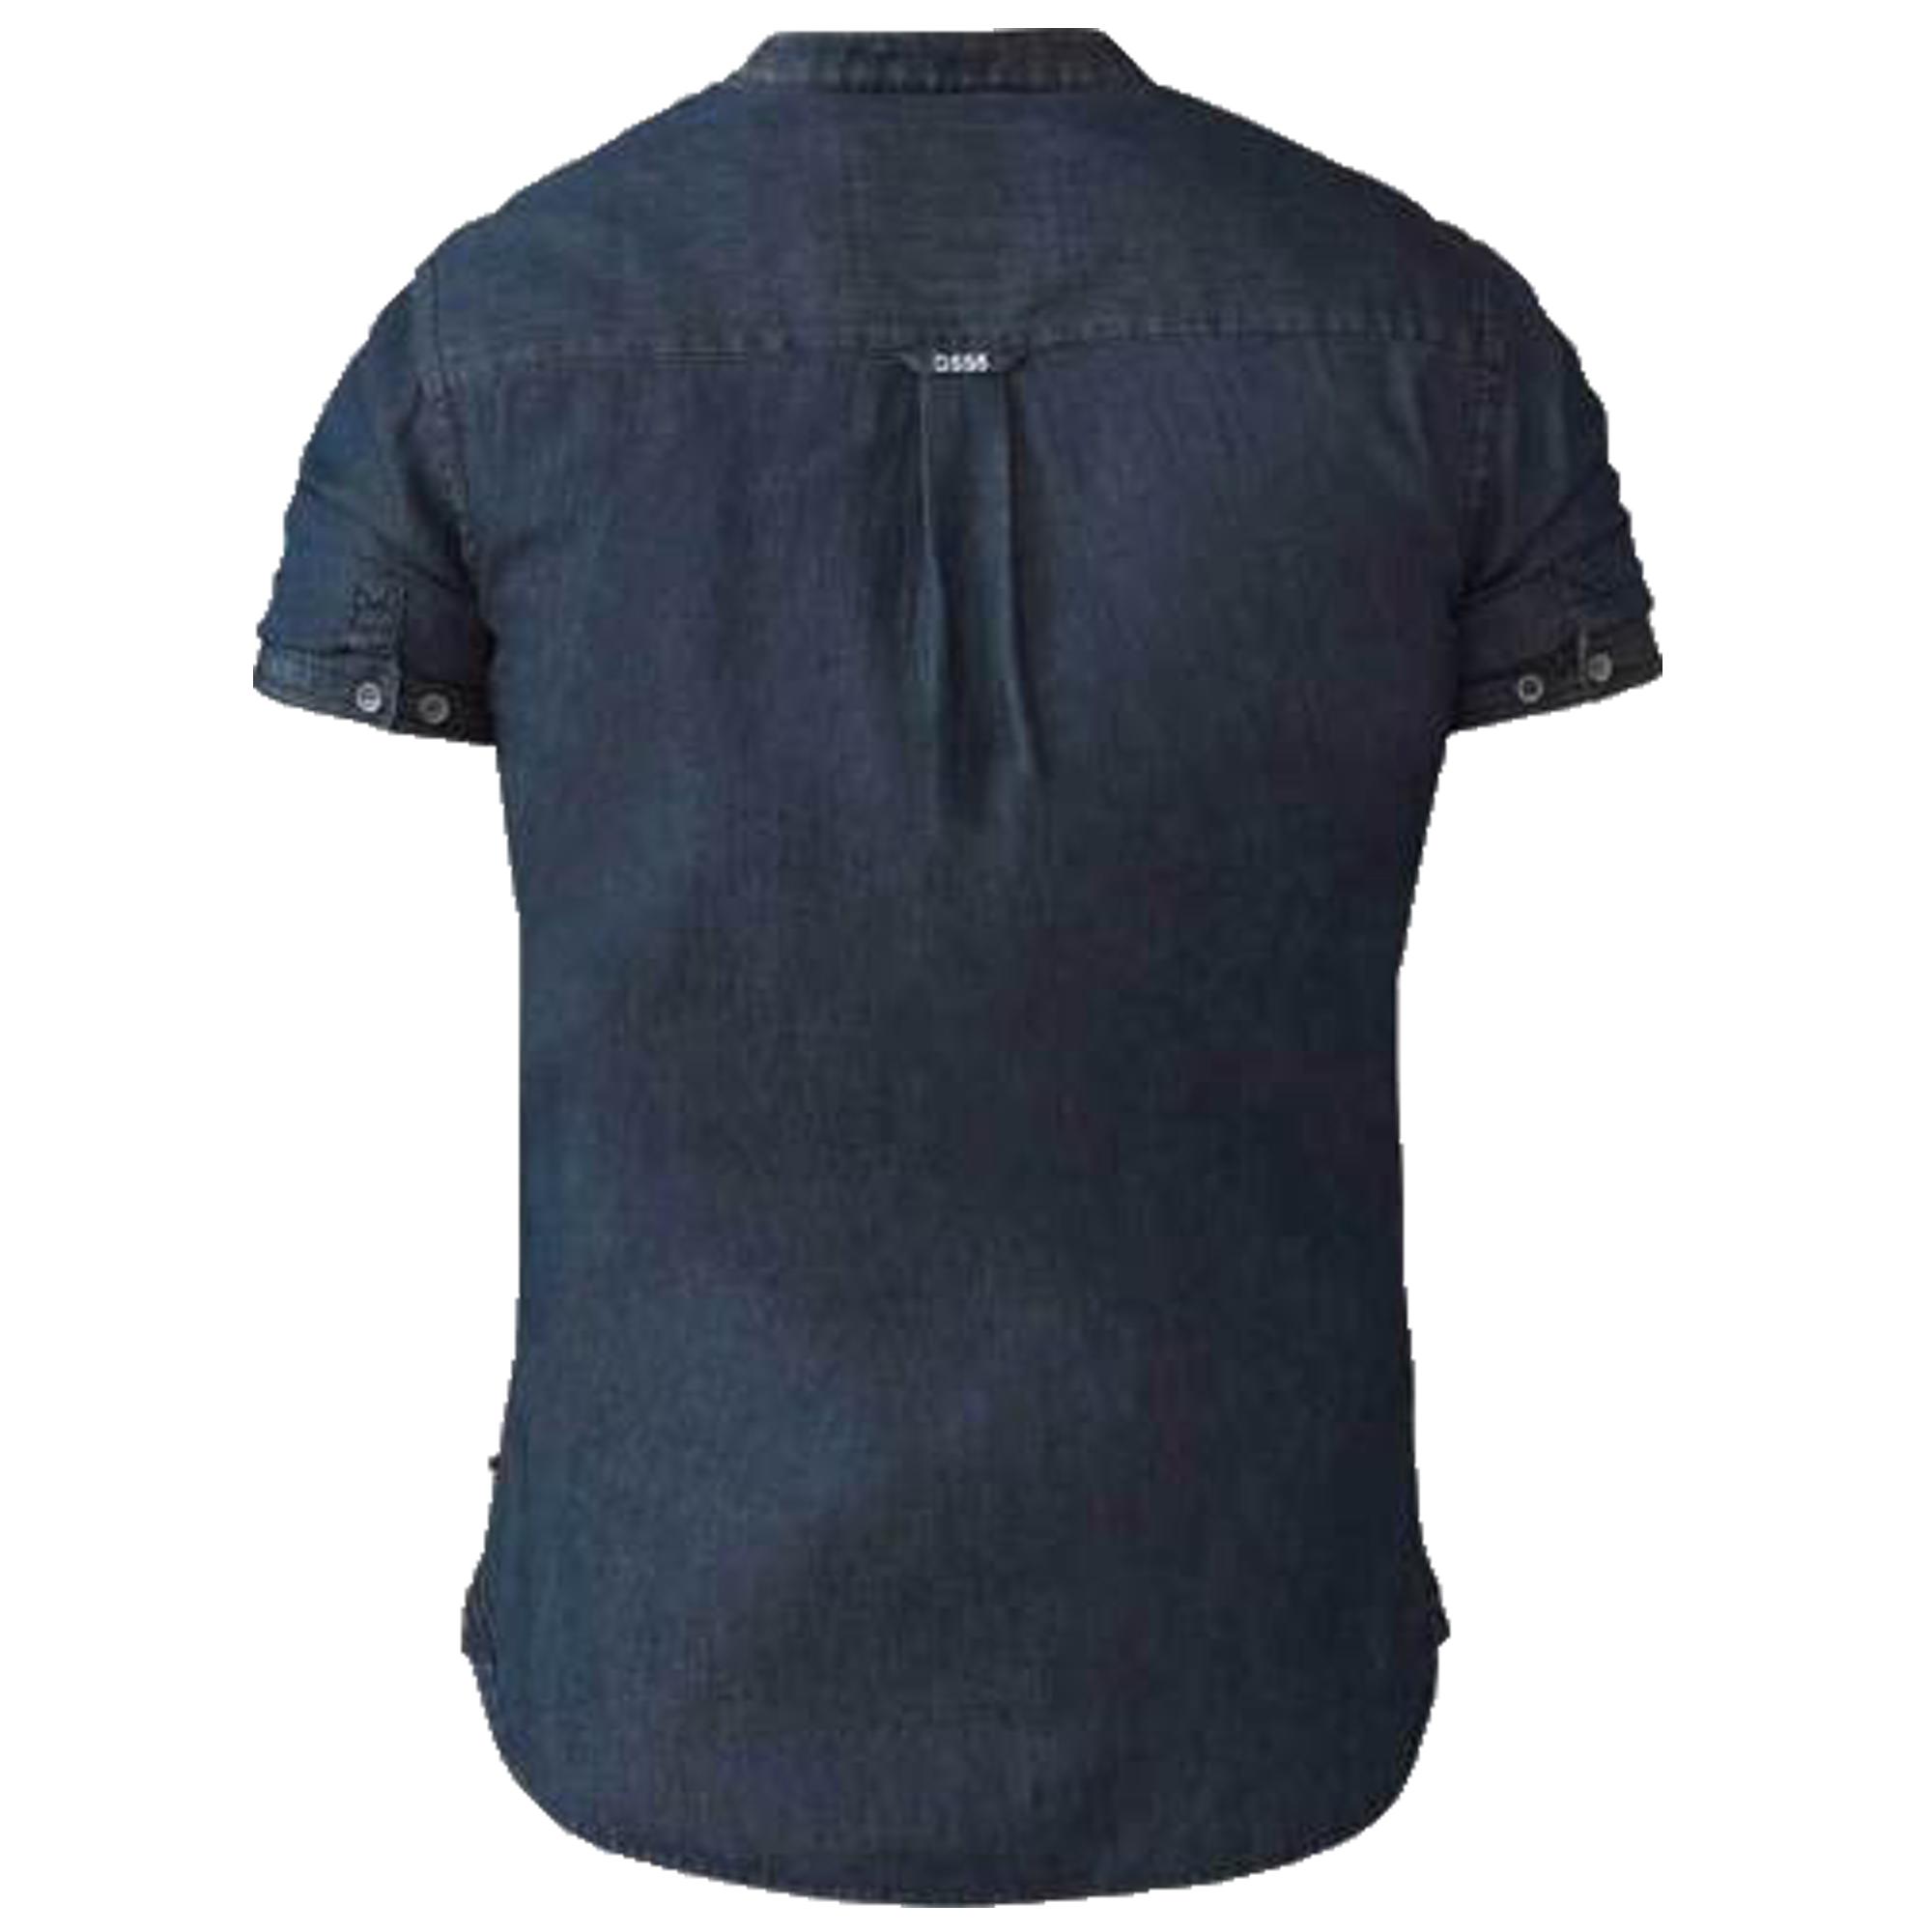 Mens-Denim-Shirt-D555-Duke-Big-King-Size-Cotton-Astra-Nathan-Short-Sleeved-New thumbnail 3